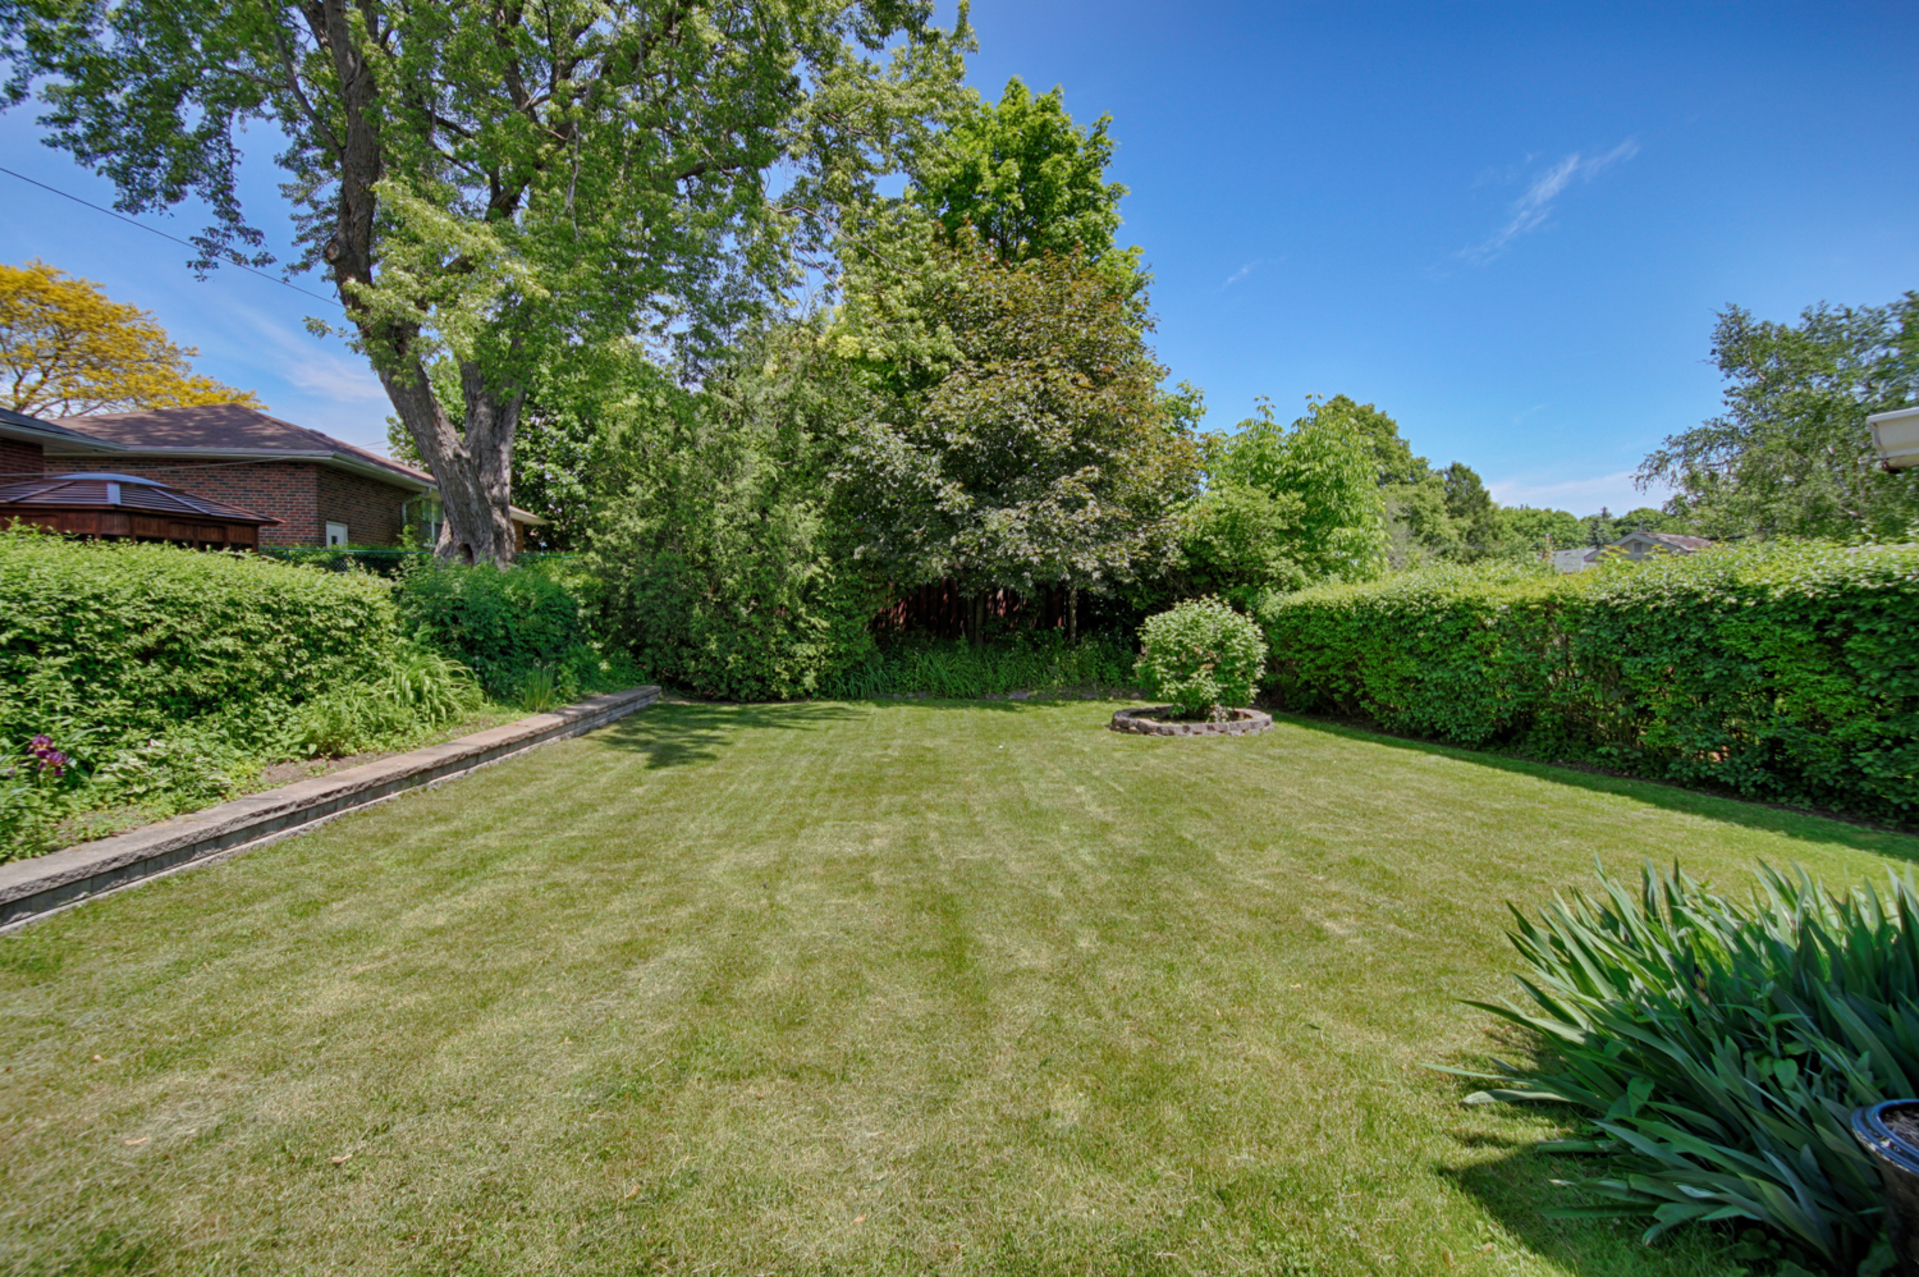 Backyard at 145 Sloane Avenue, Victoria Village, Toronto